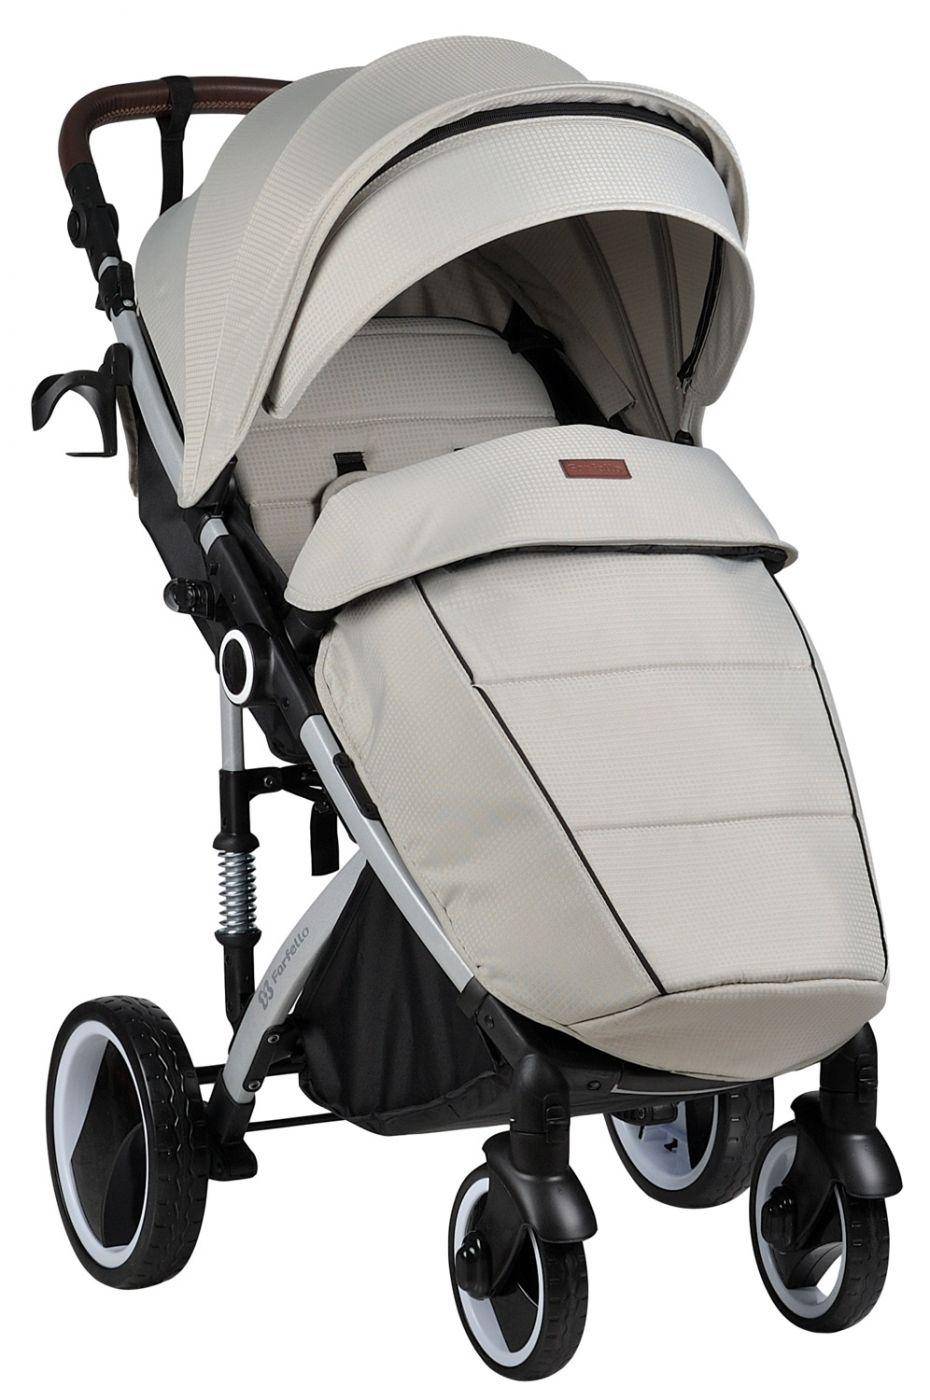 Прогулочная коляска Bino Angel Plus, steel gray / стальной серый - NEW